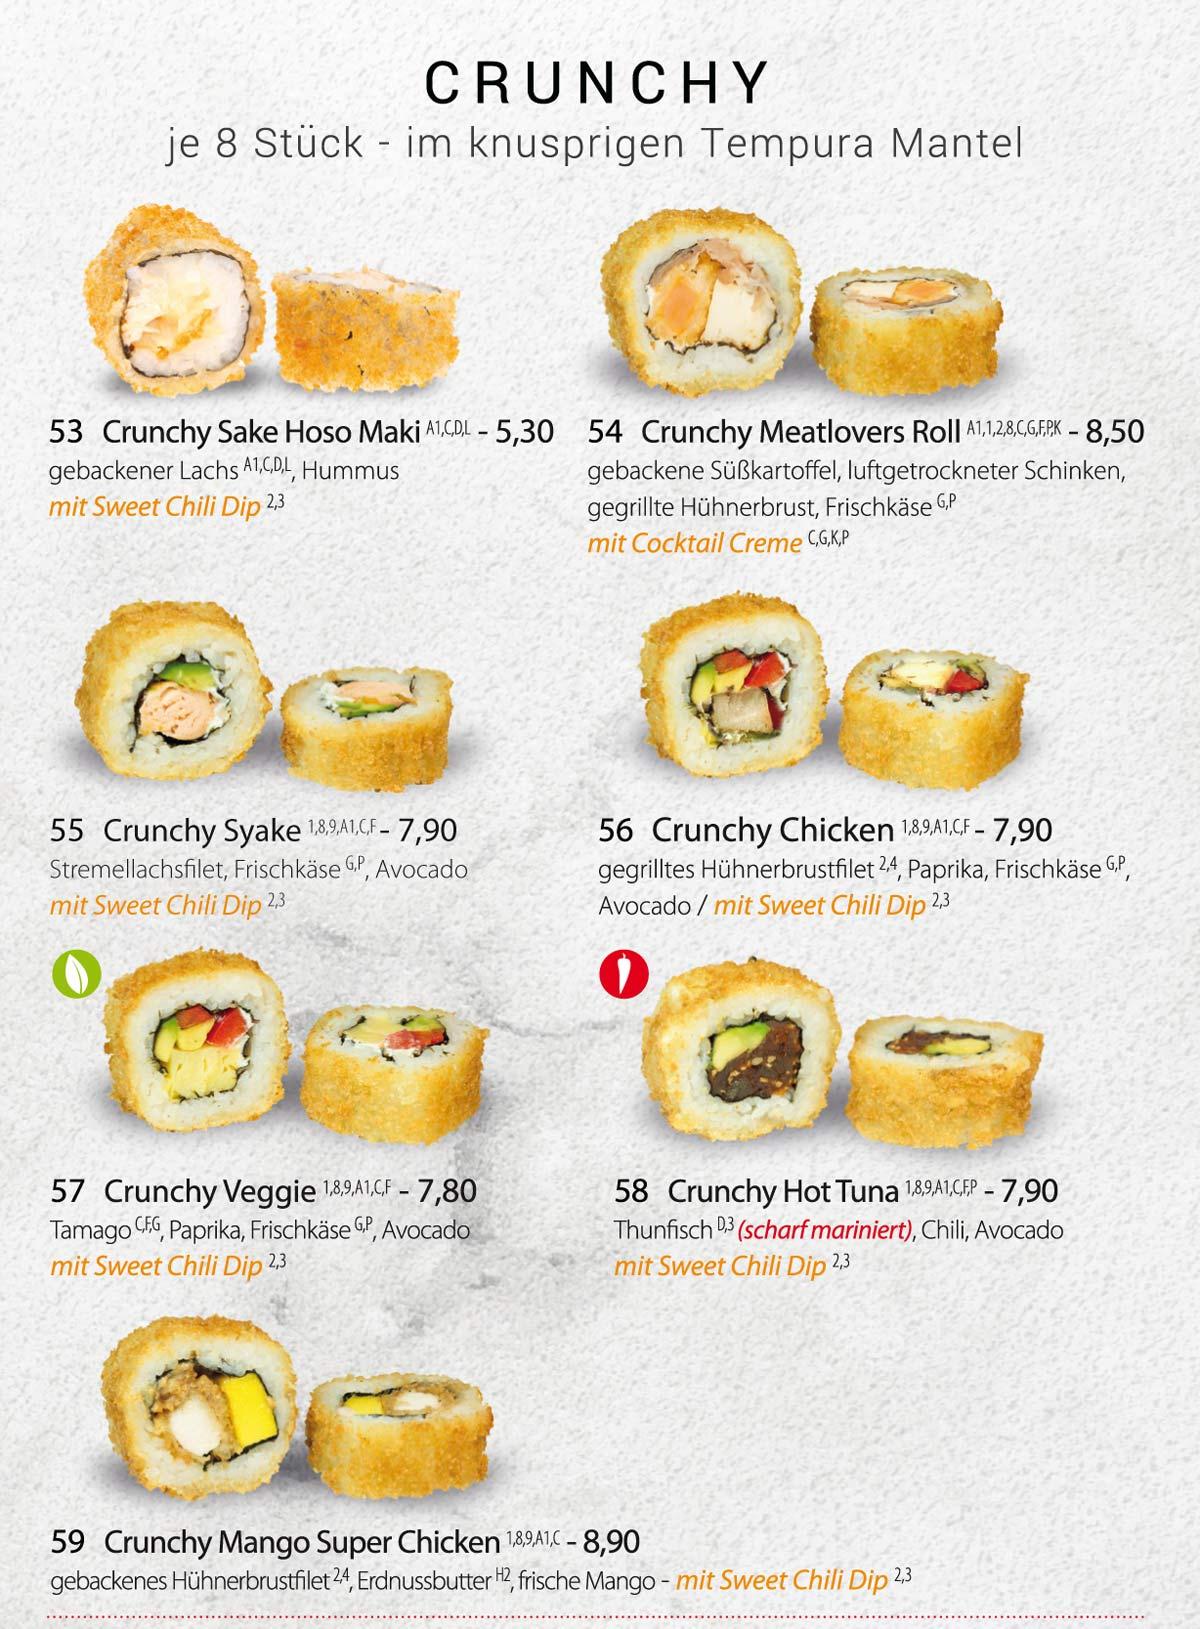 Sushifreunde | Speisekarte | Crunchy - Je 8 Stück im knusprigen Tempura Mantel